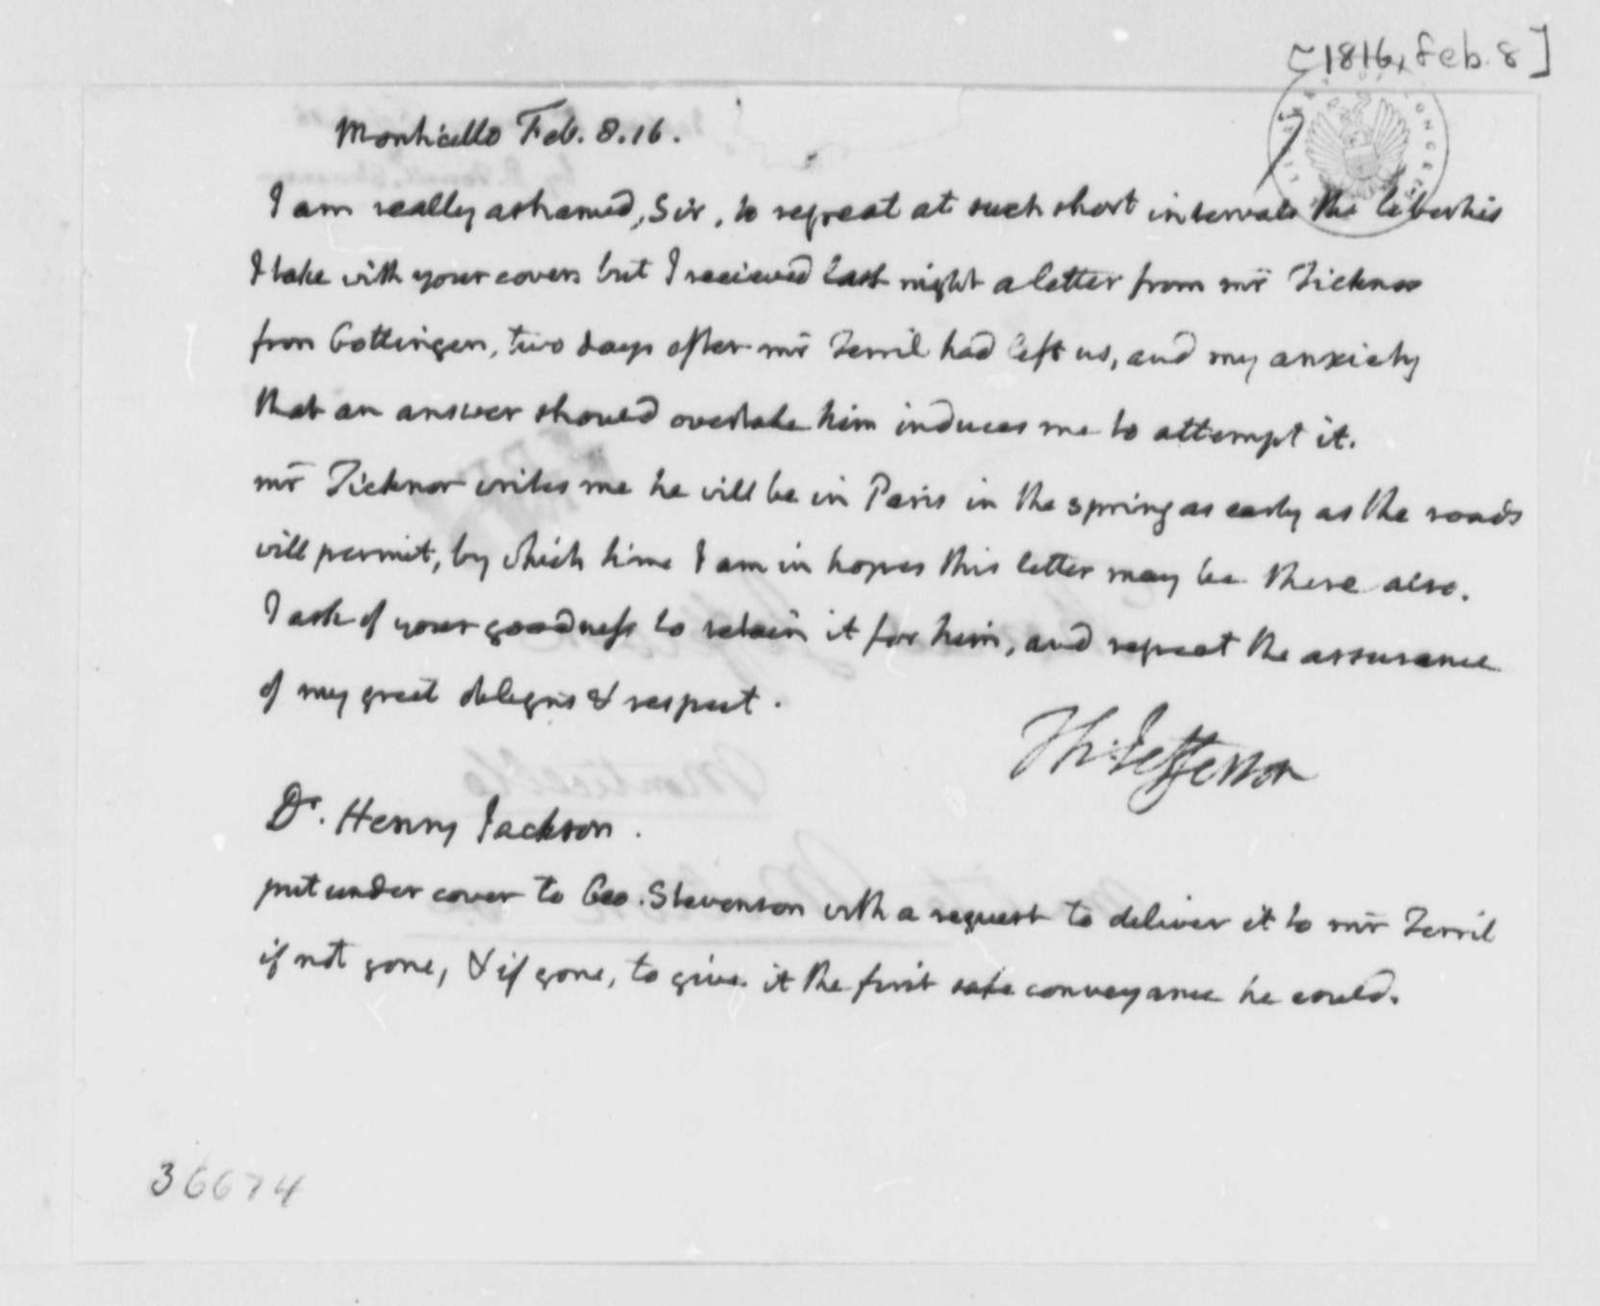 Thomas Jefferson to Henry Jackson, February 8, 1816